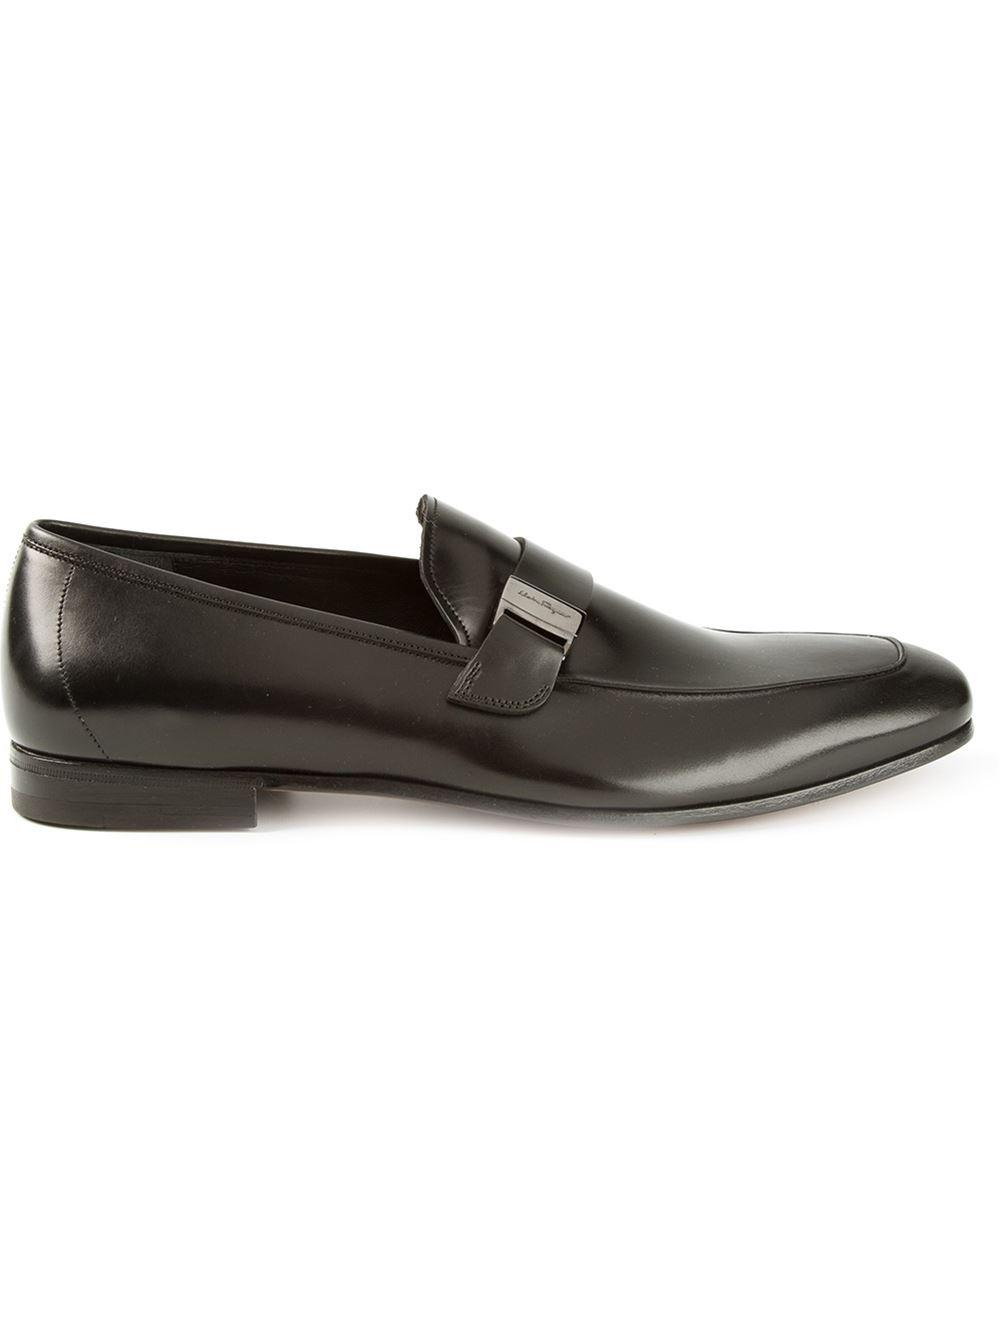 Salvatore Ferragamo Alan Suede Slip On Shoes